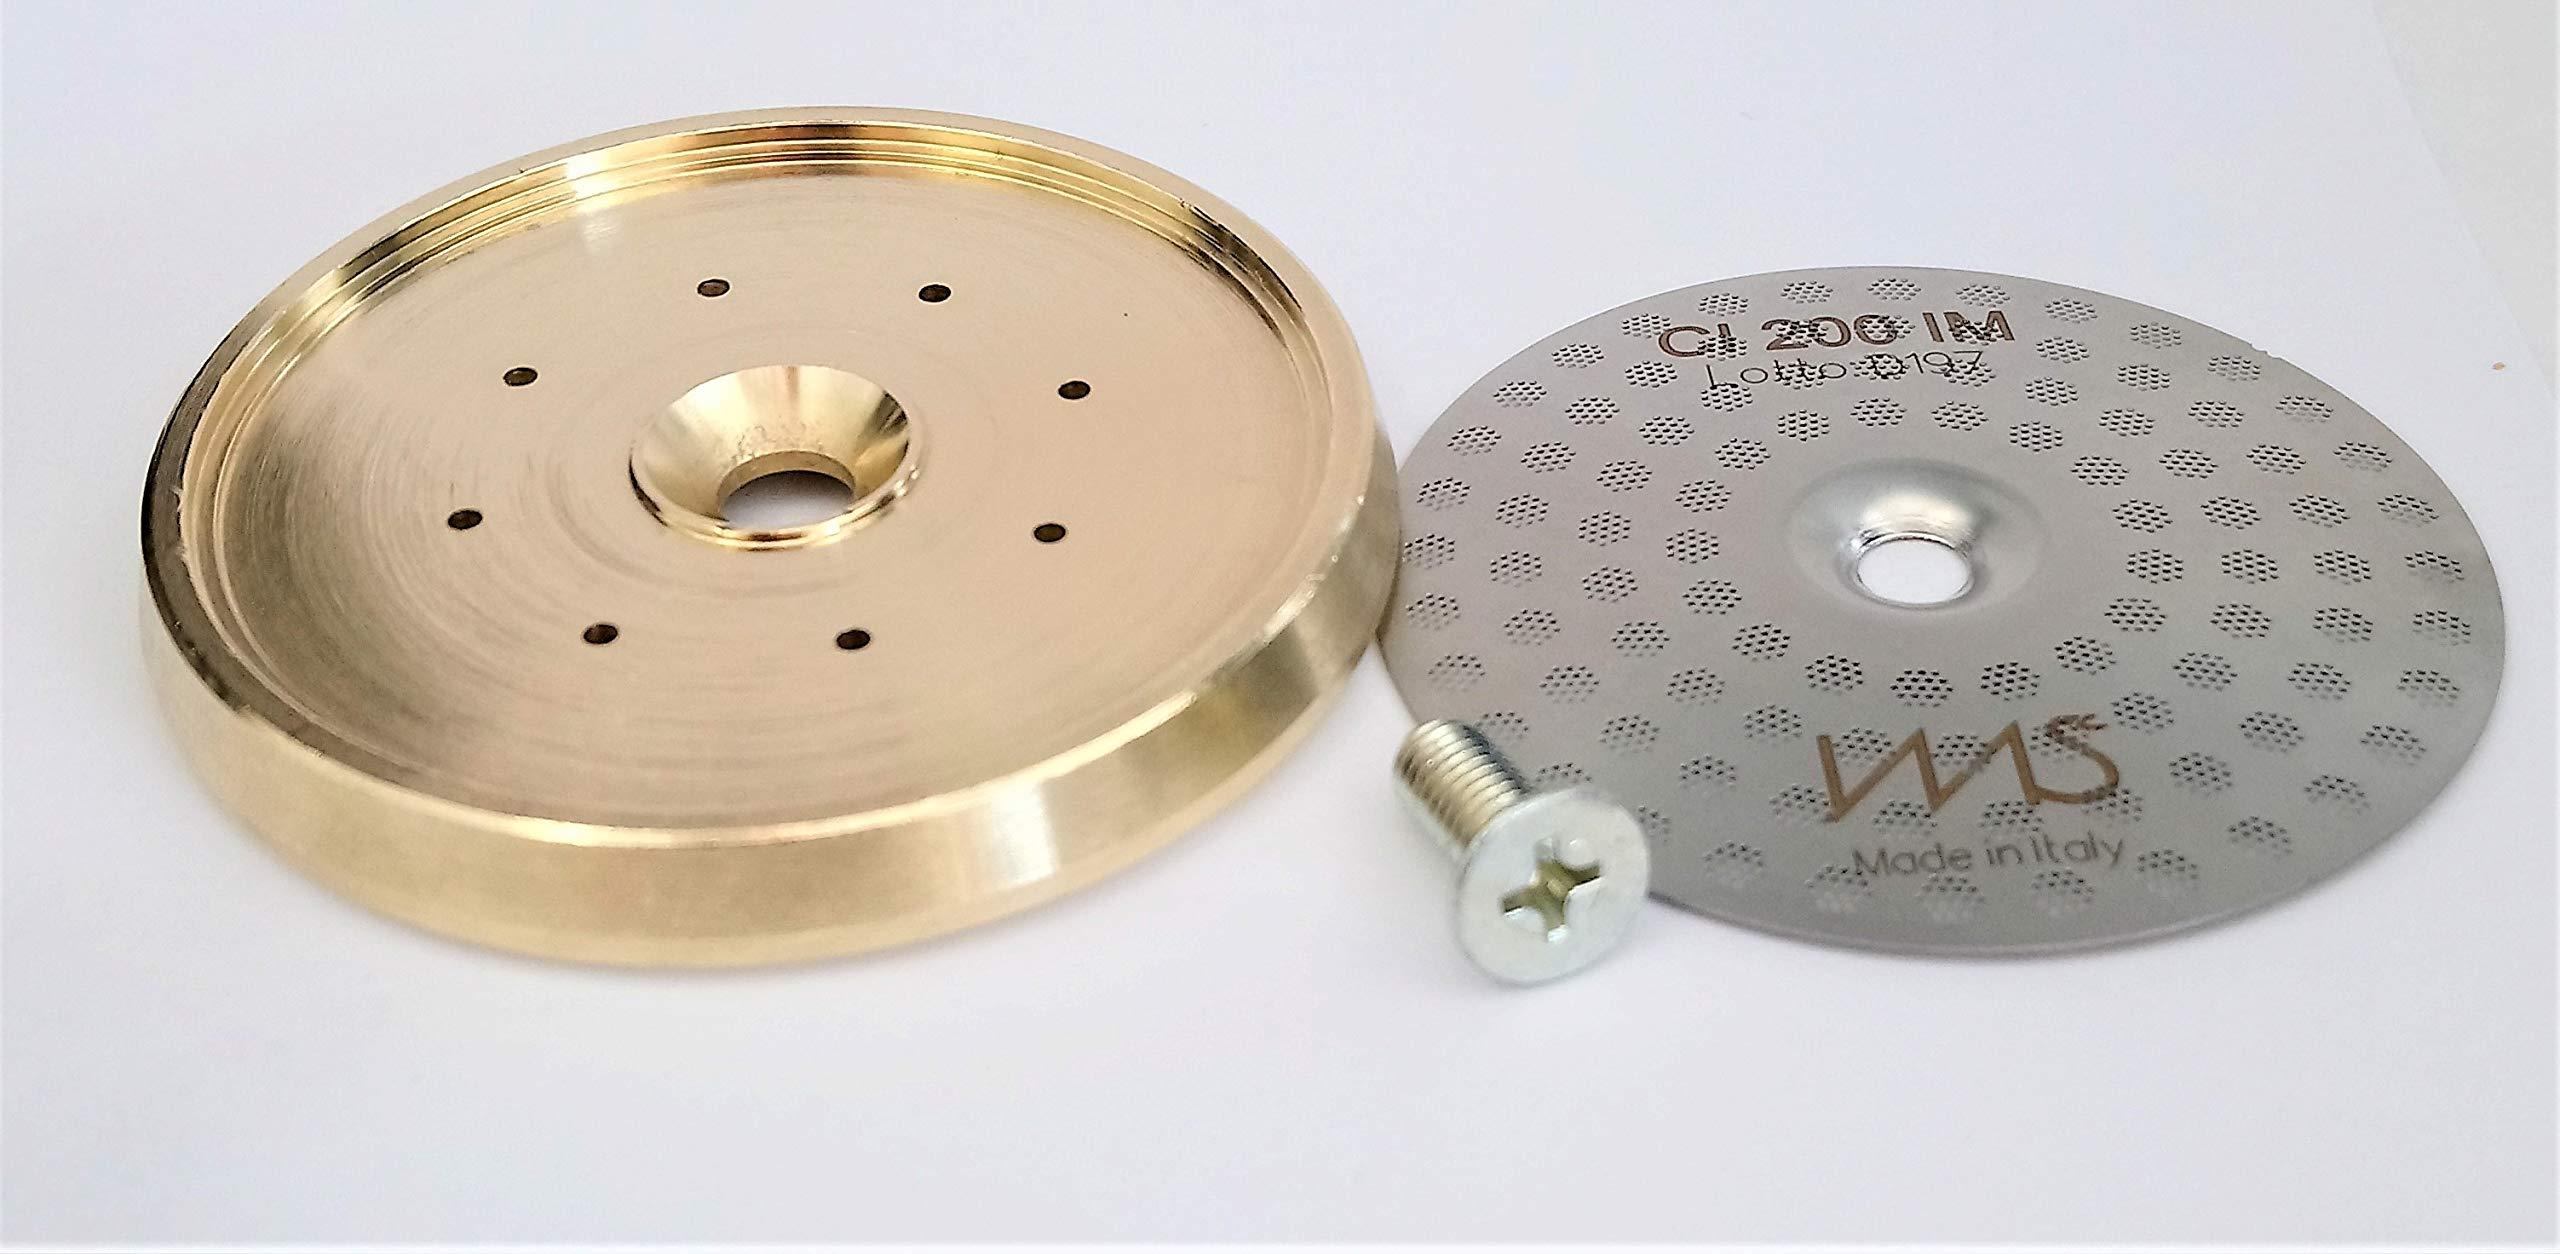 Breville shower screen and inner holder. Custom tune up kit for 58mm Breville BES900XL BES920XL BES980XL. IMS Precision Shower Screen and Brass inner holder by VeryBarista (Image #3)